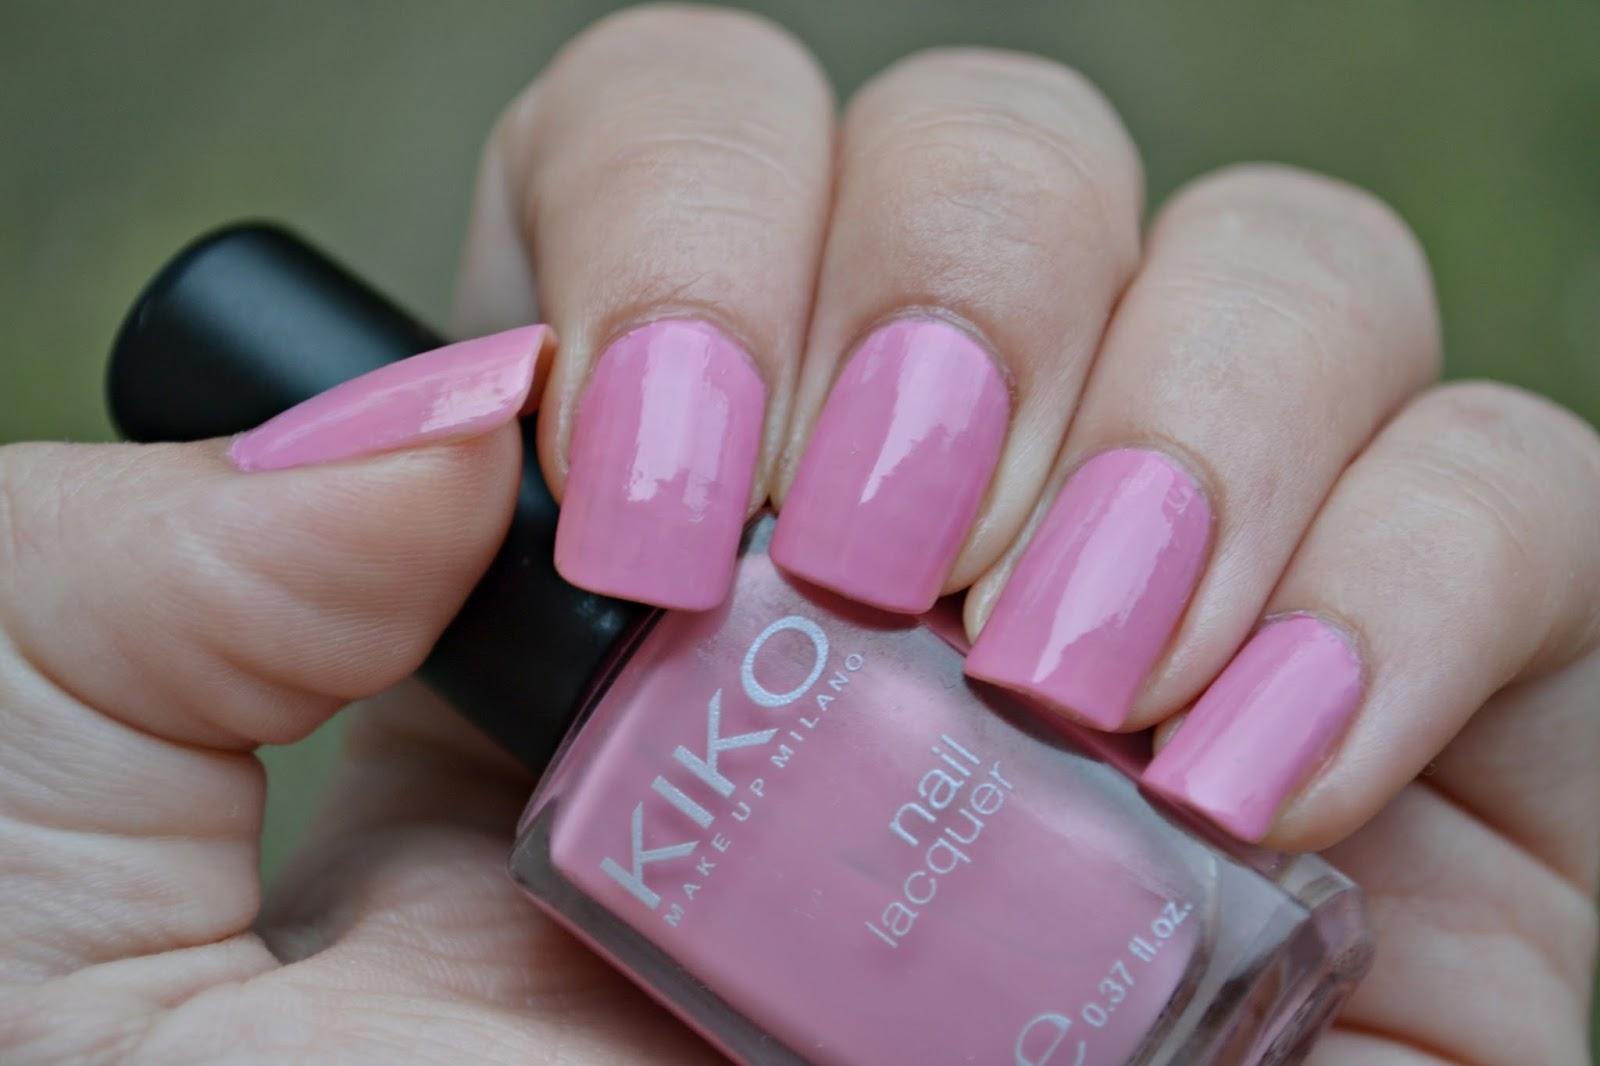 Kiko 377 Apple Blossom